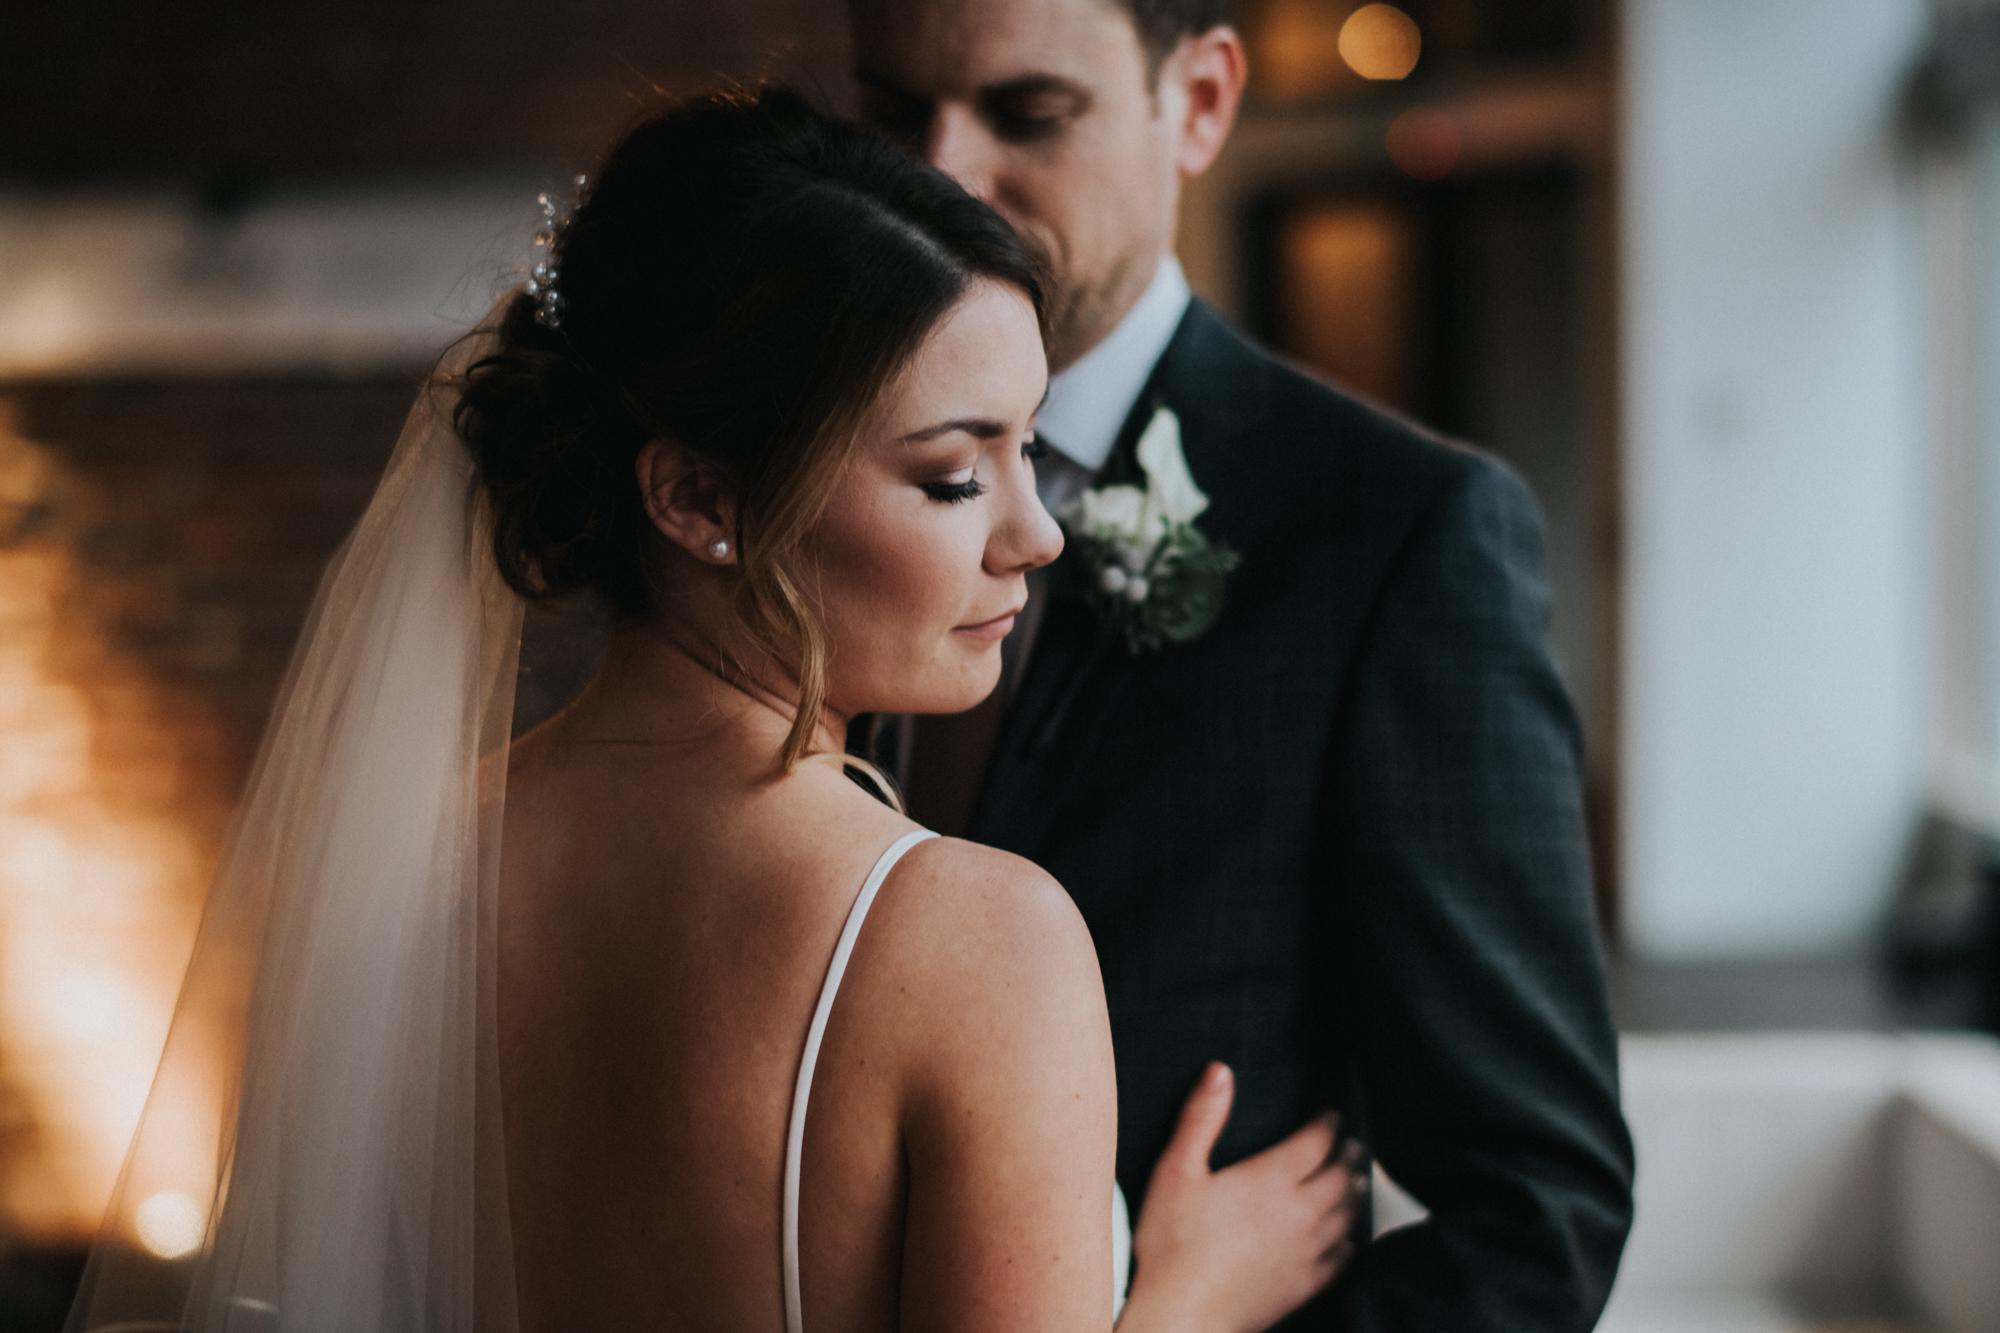 Wedding at Axis Pioneer Square in Seattle, WA | Meghan & Kash